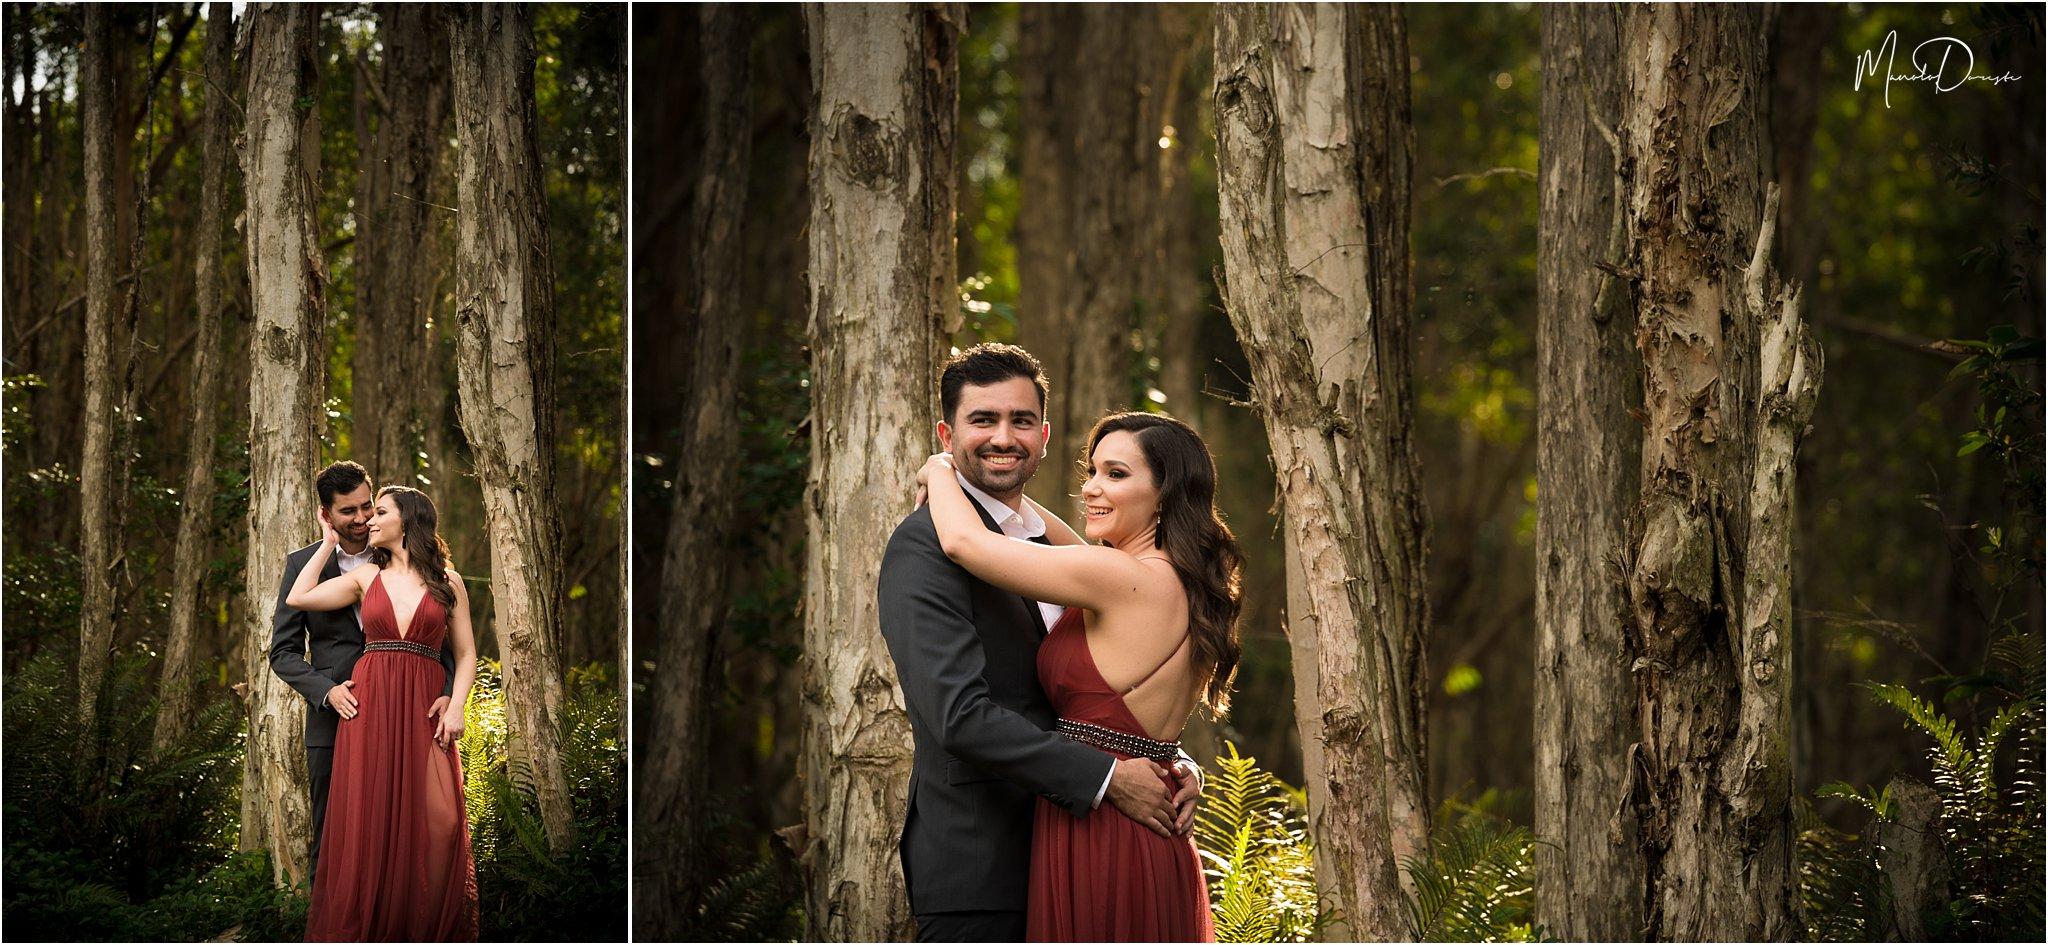 00815_ManoloDoreste_InFocusStudios_Wedding_Family_Photography_Miami_MiamiPhotographer.jpg